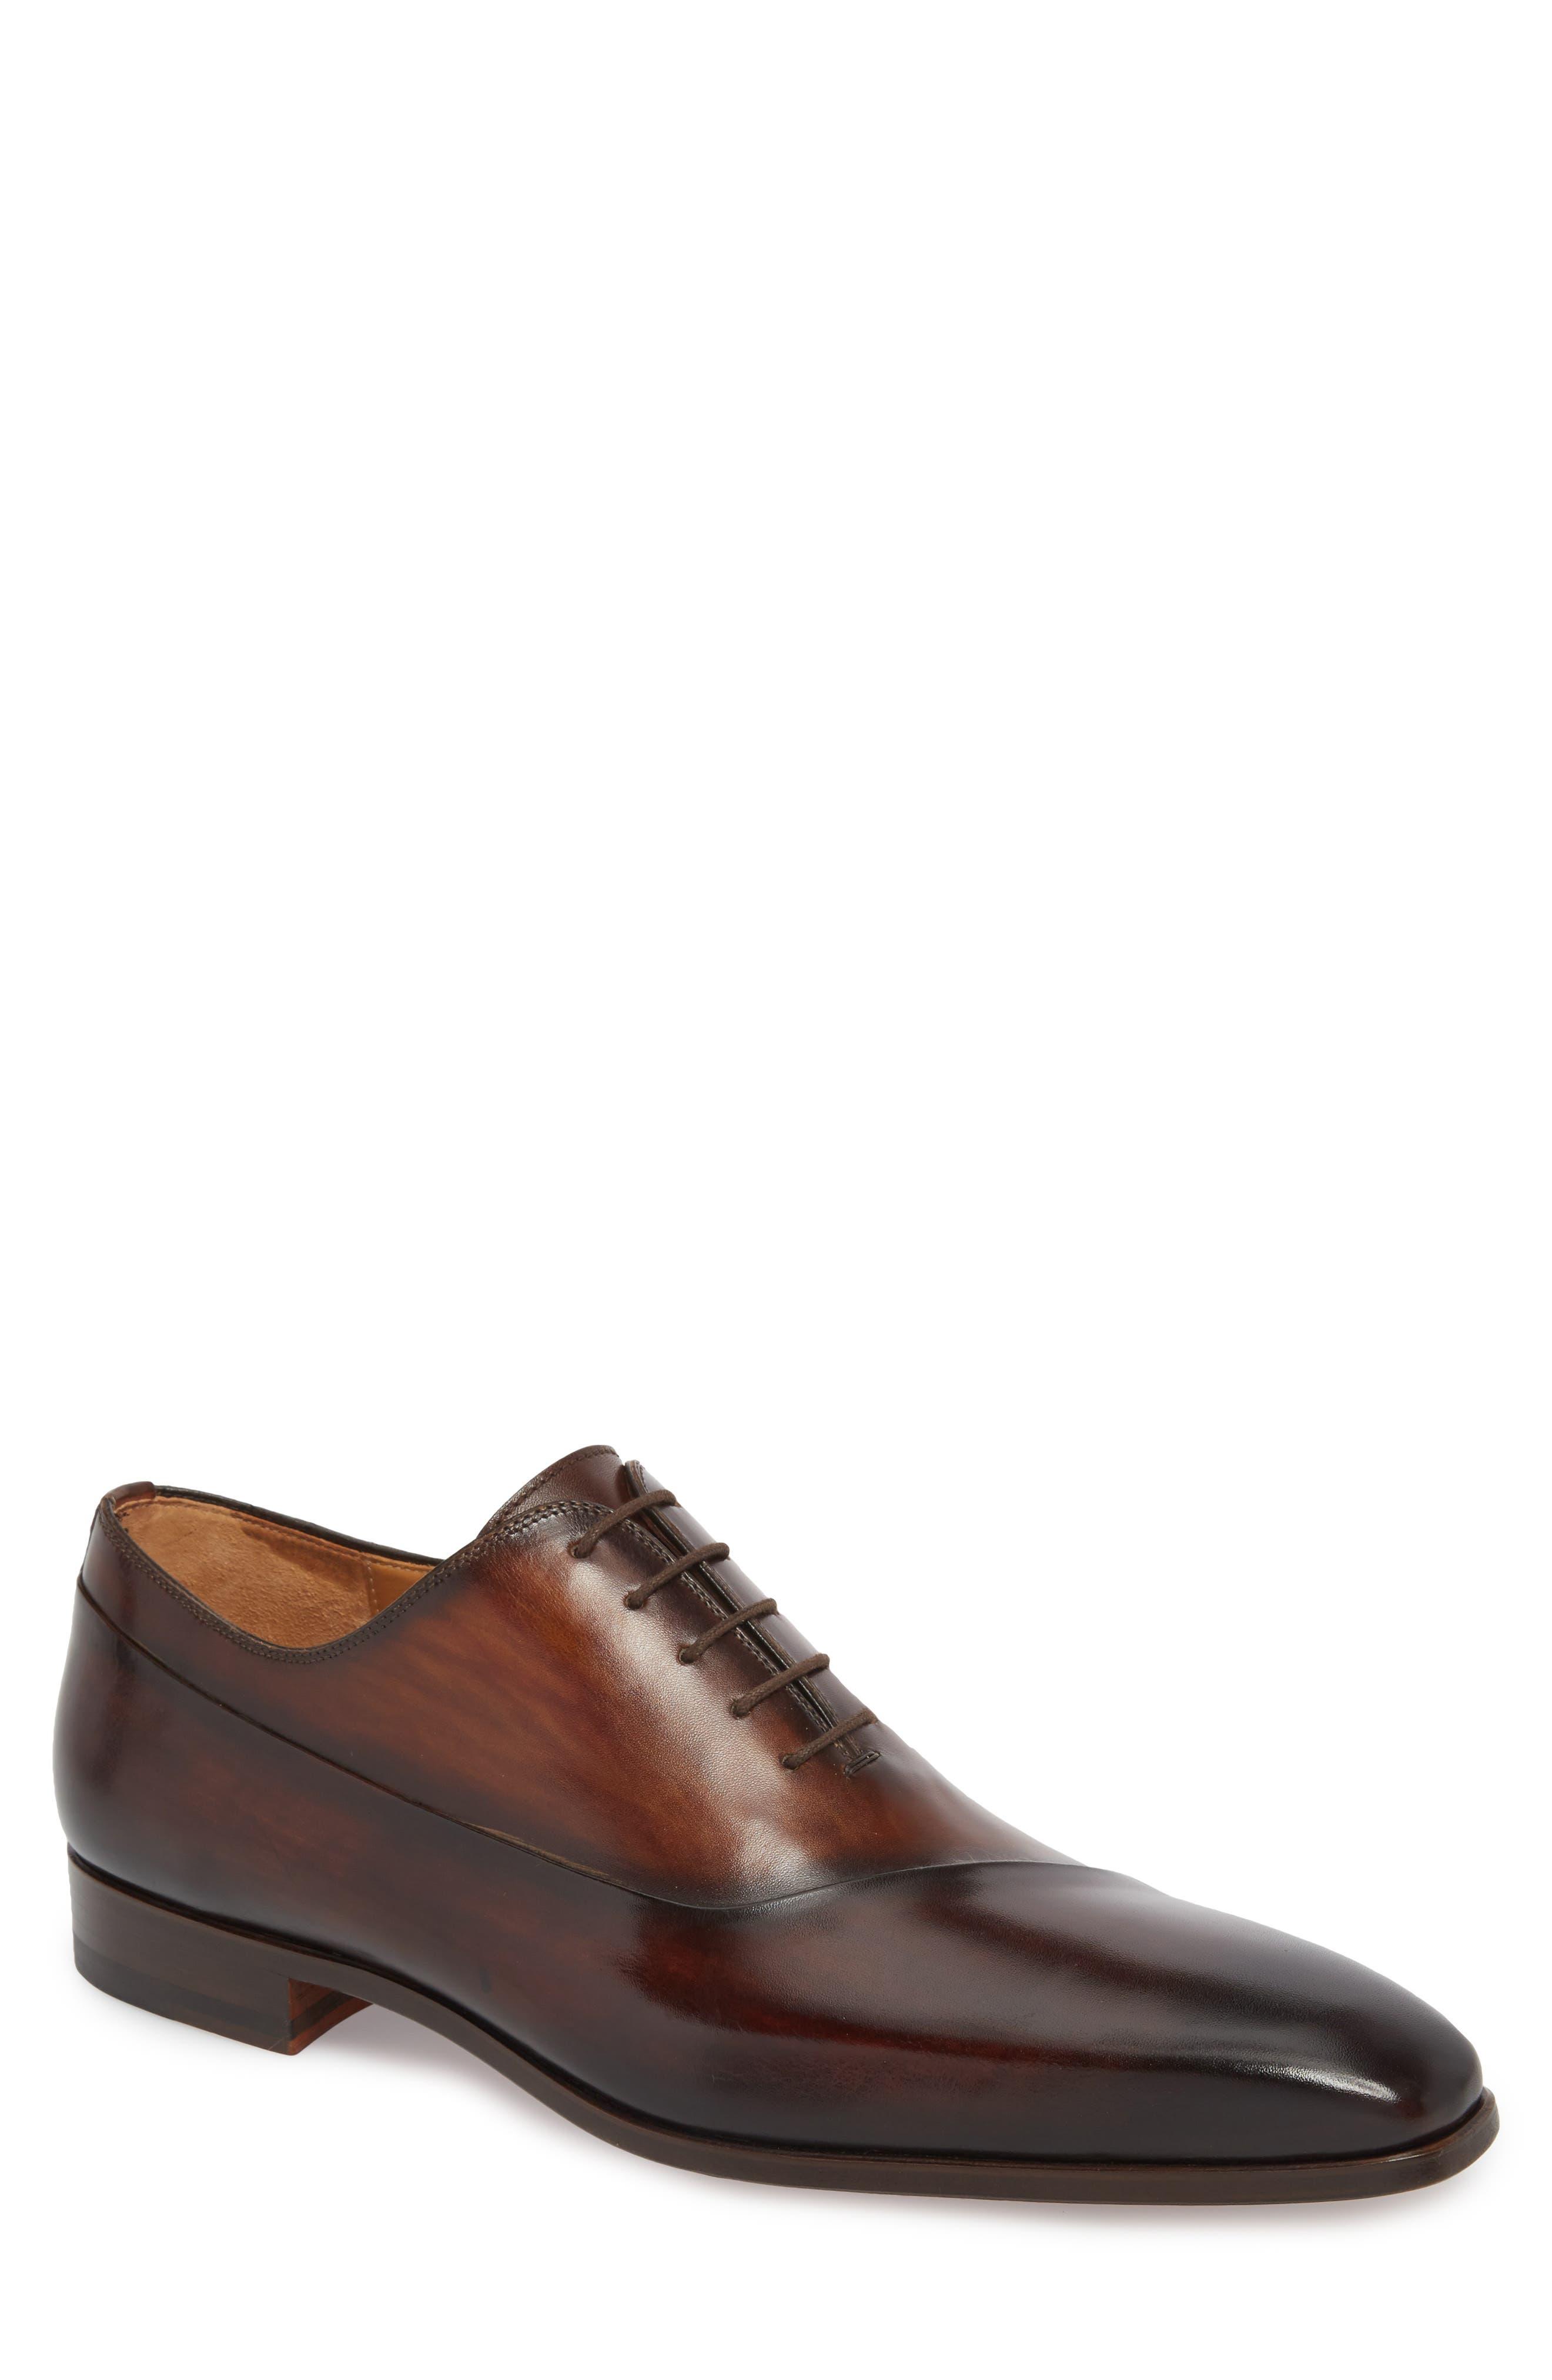 Cristiano Asymmetrical Whole Cut Shoe,                             Main thumbnail 1, color,                             200